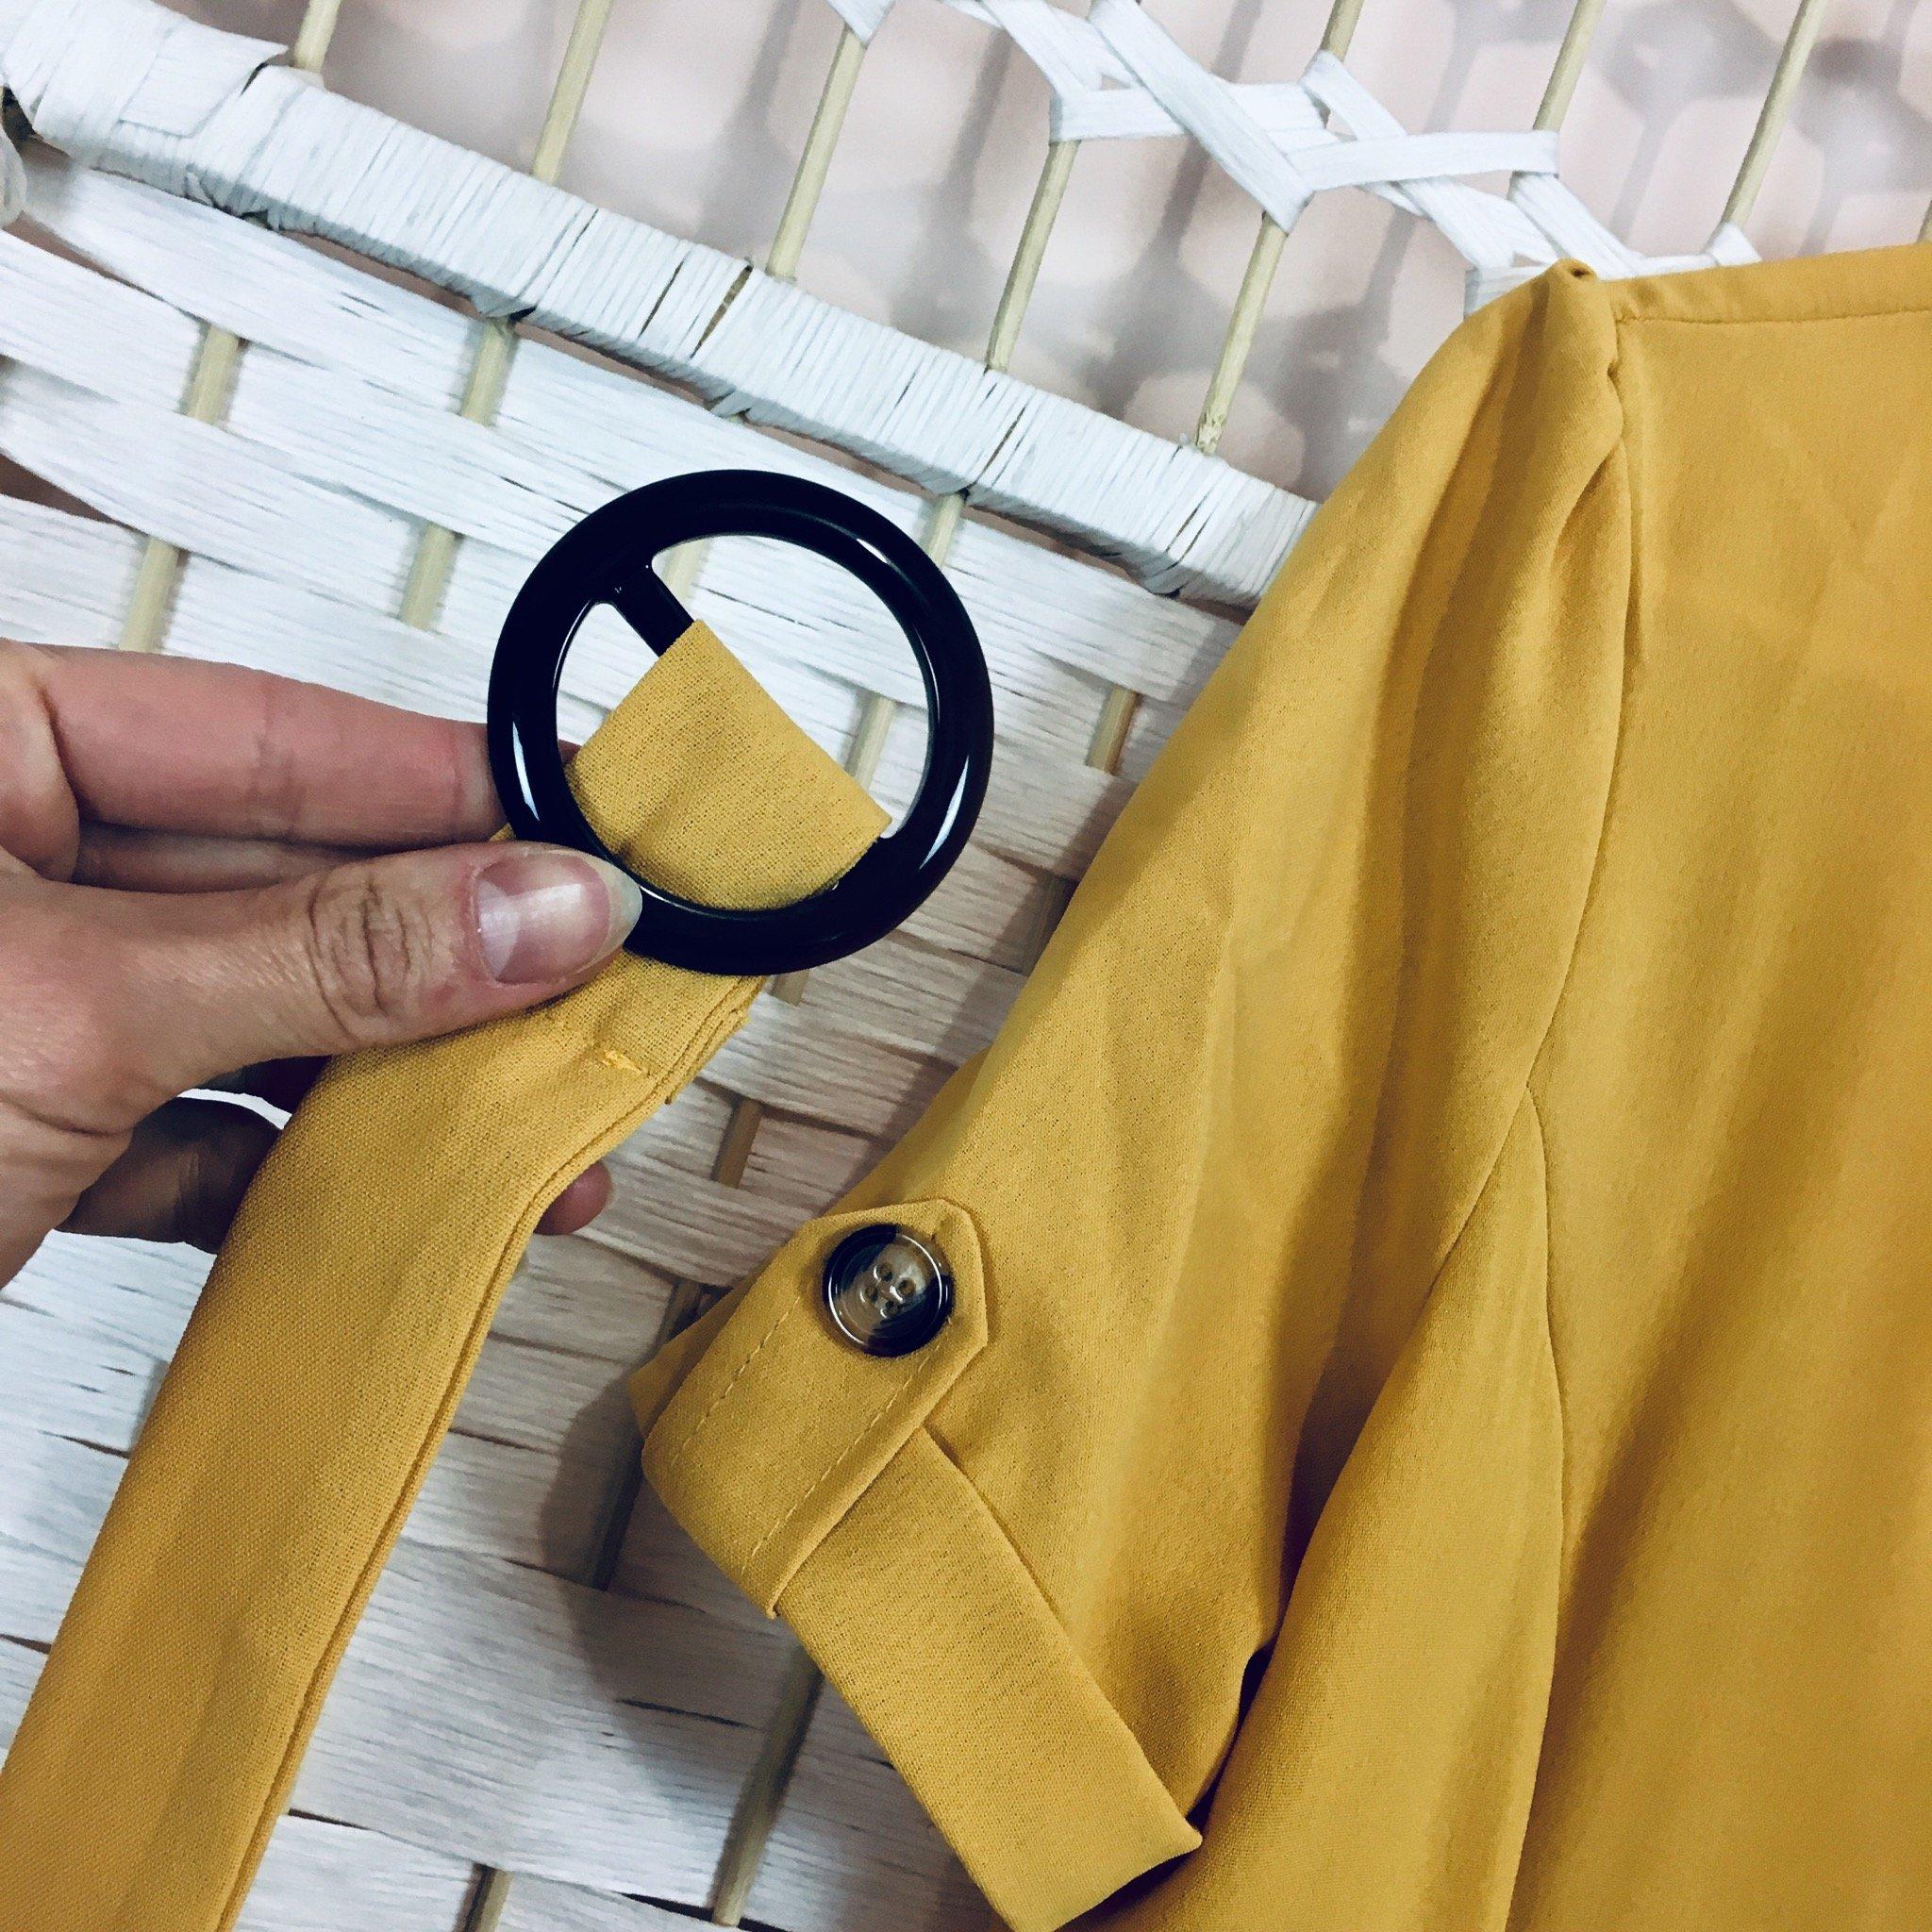 Платье халатик из miss moly Trendy Store - обзор